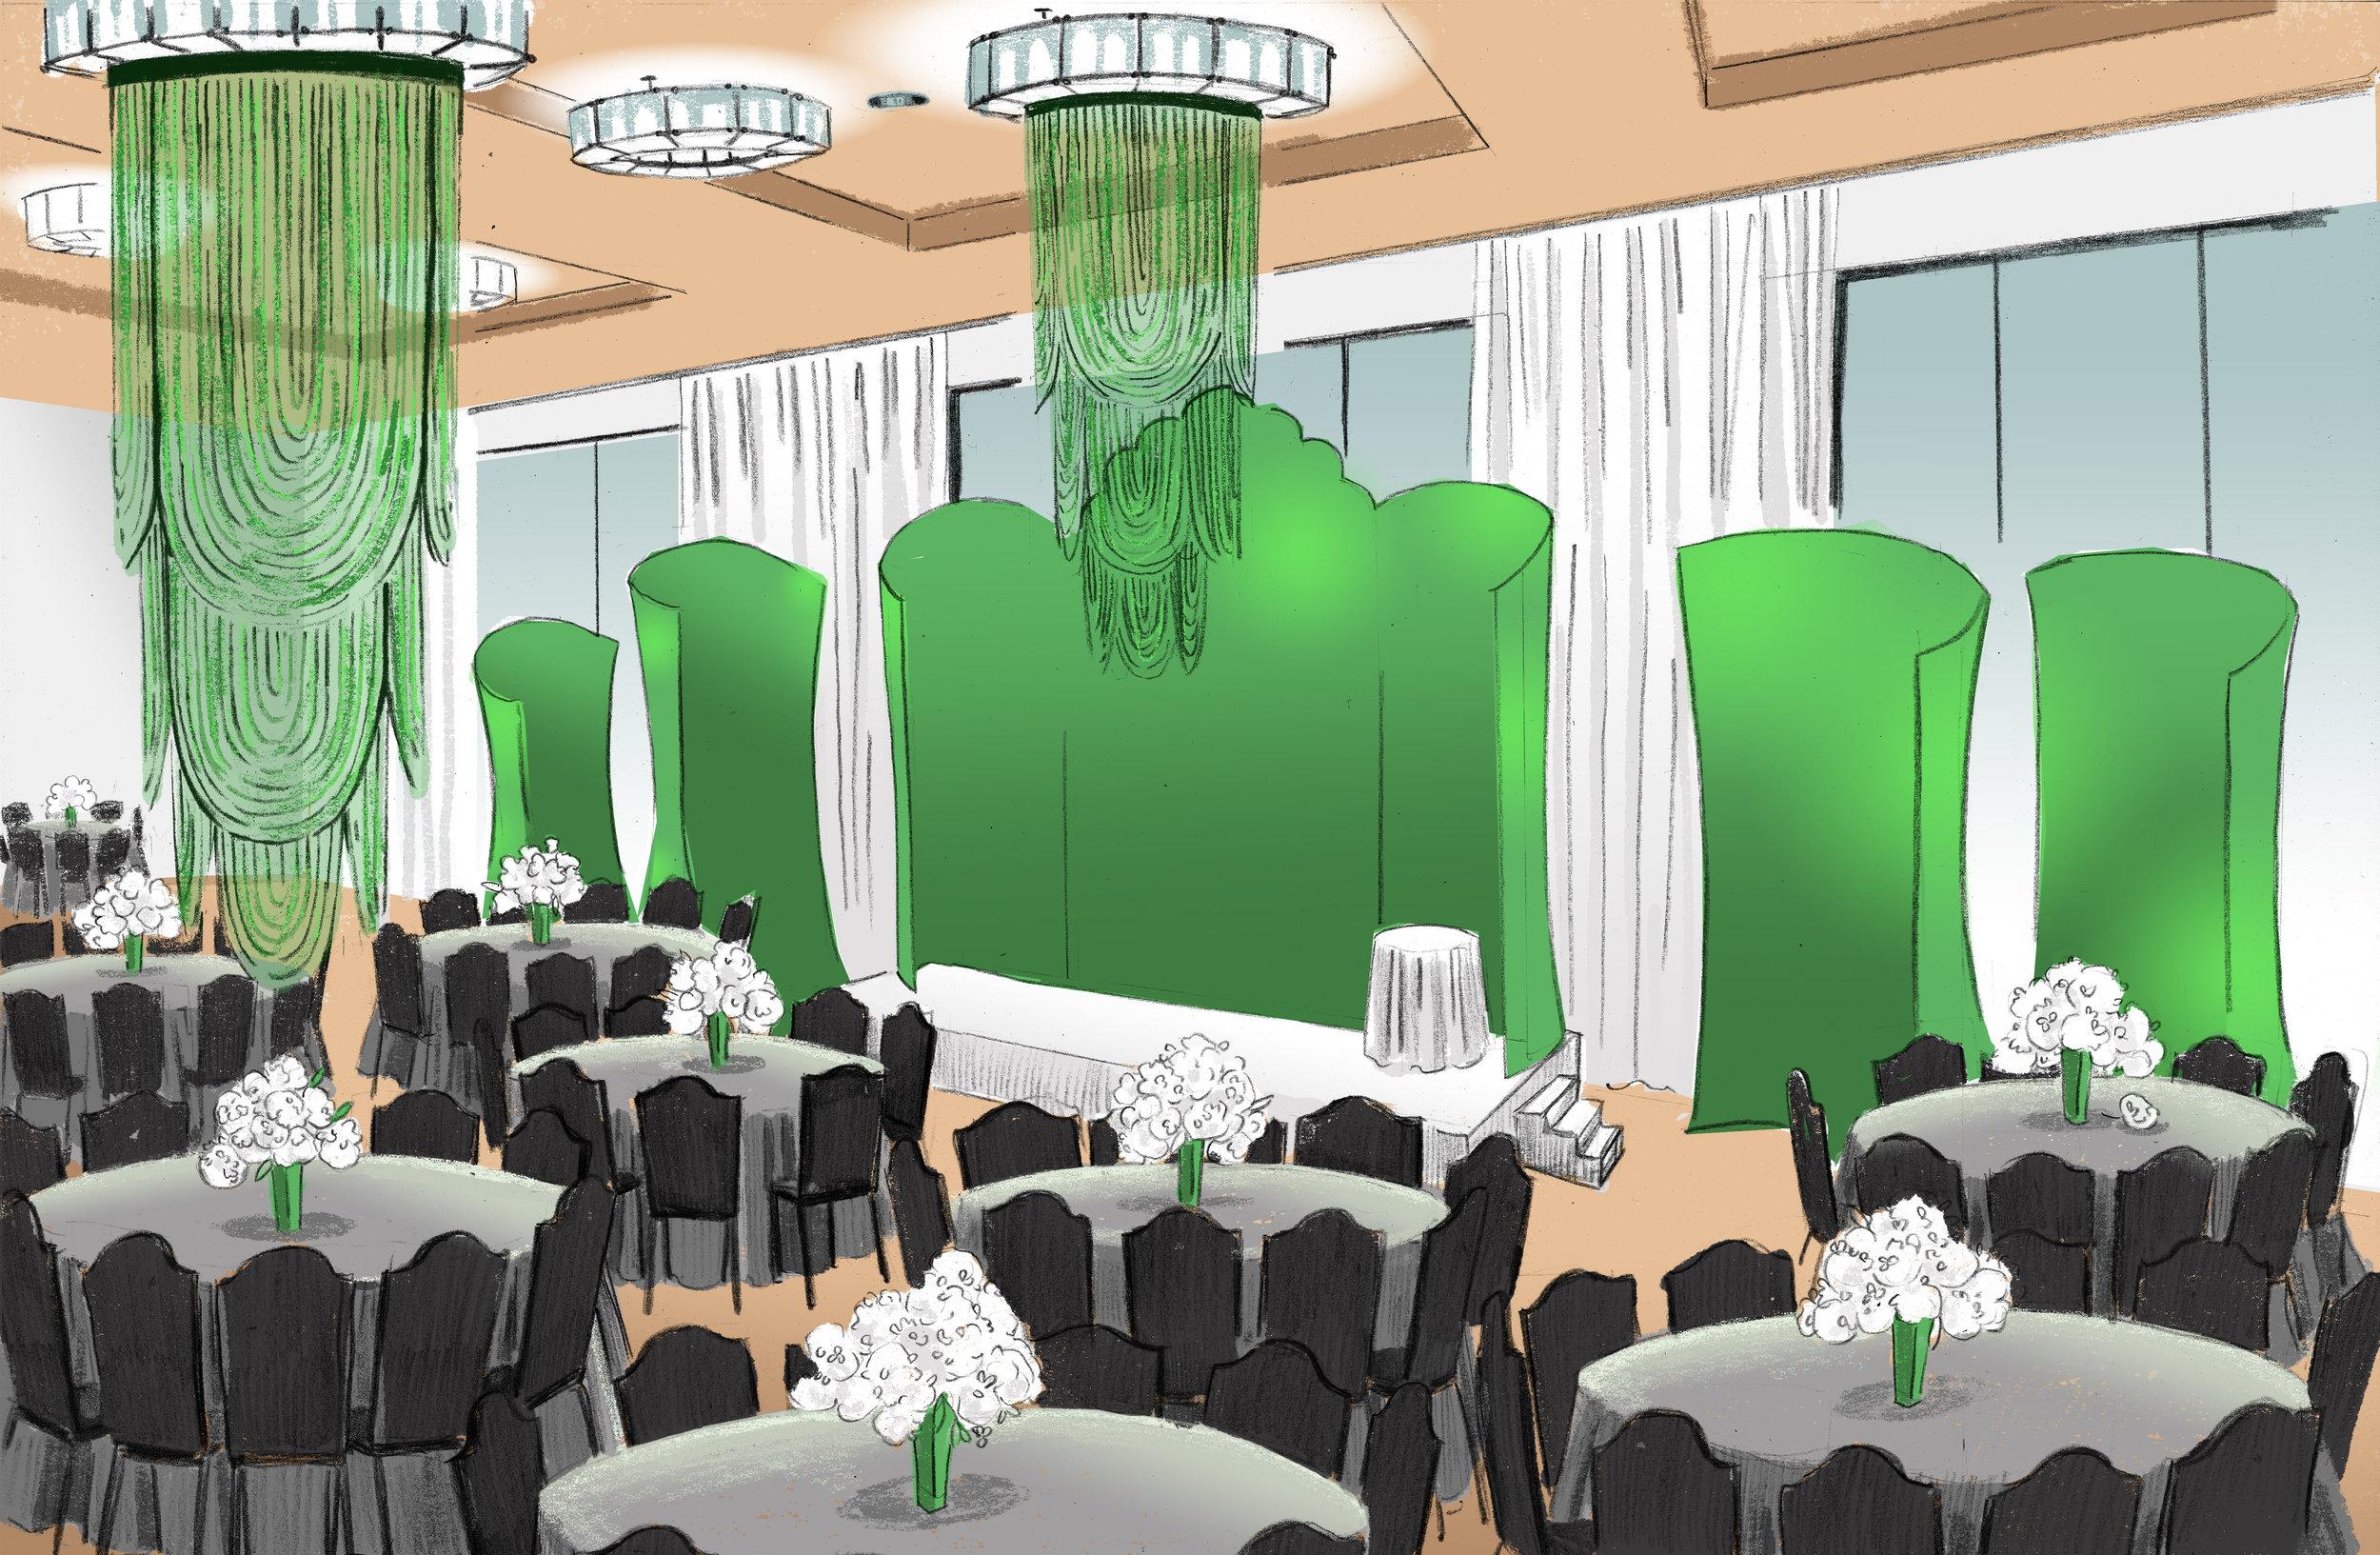 Ballroom_300dpi_Abigail McCoy.jpg